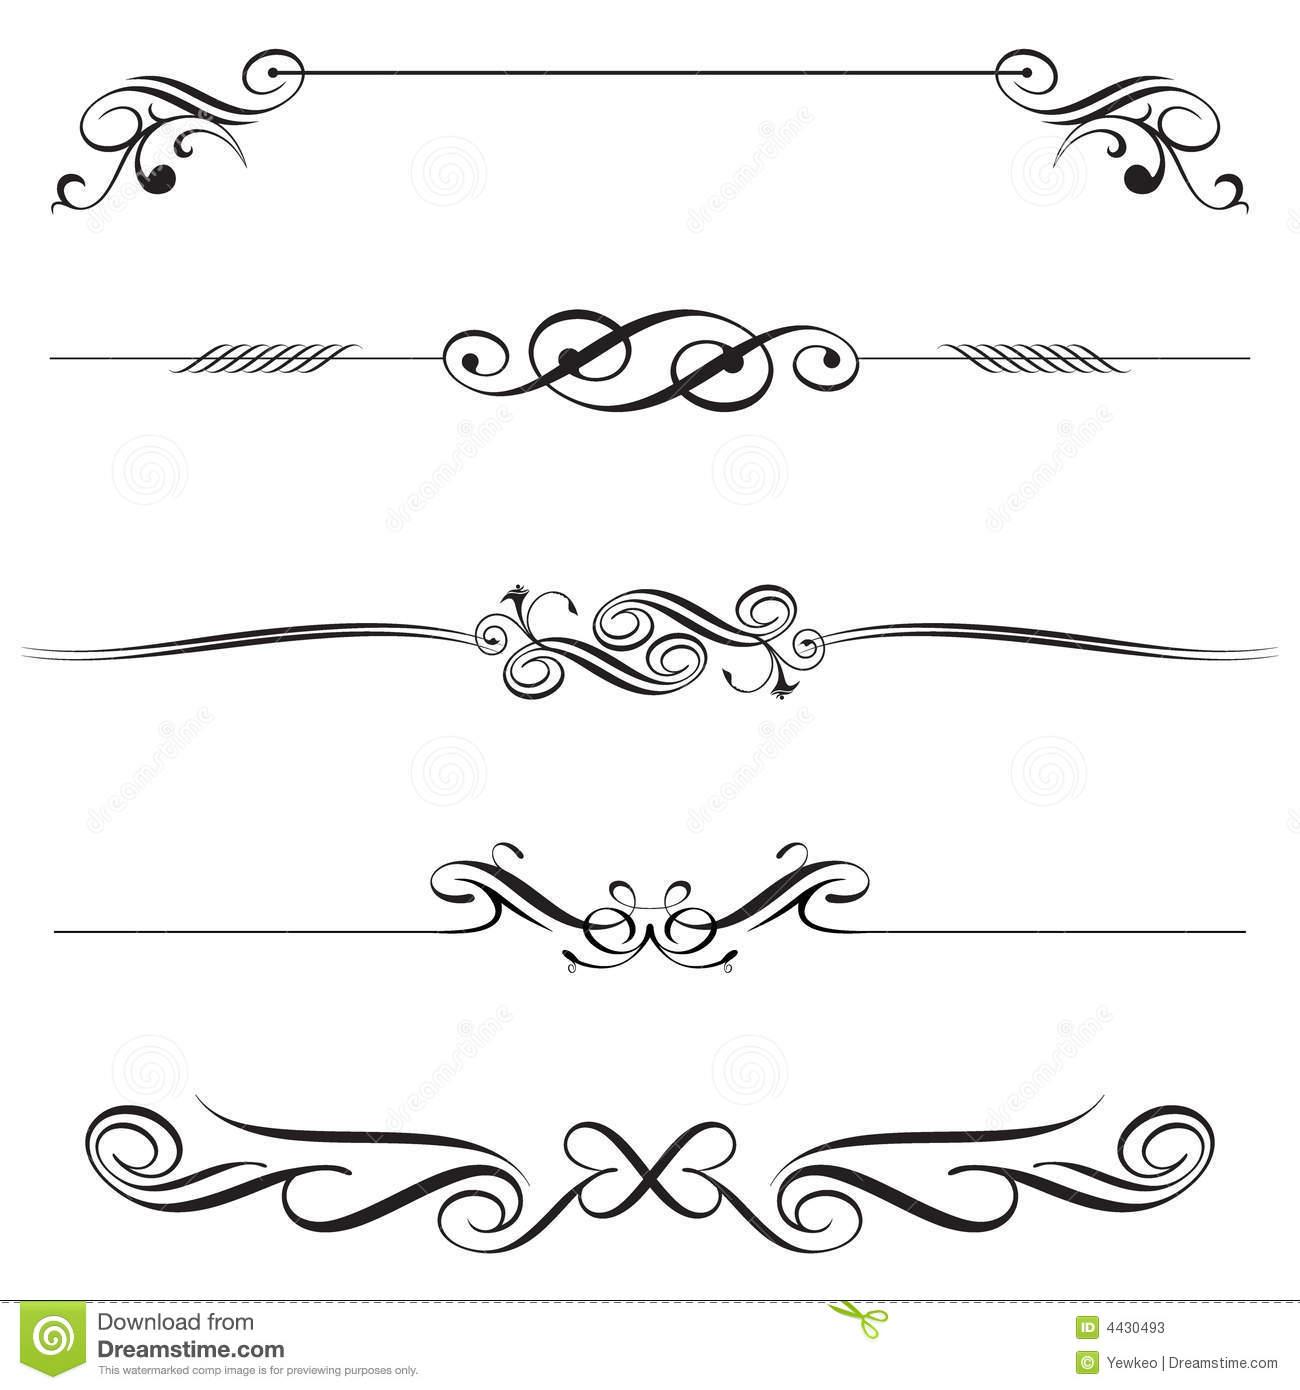 Horizontal Line Art : Decorative line vector free download pixshark